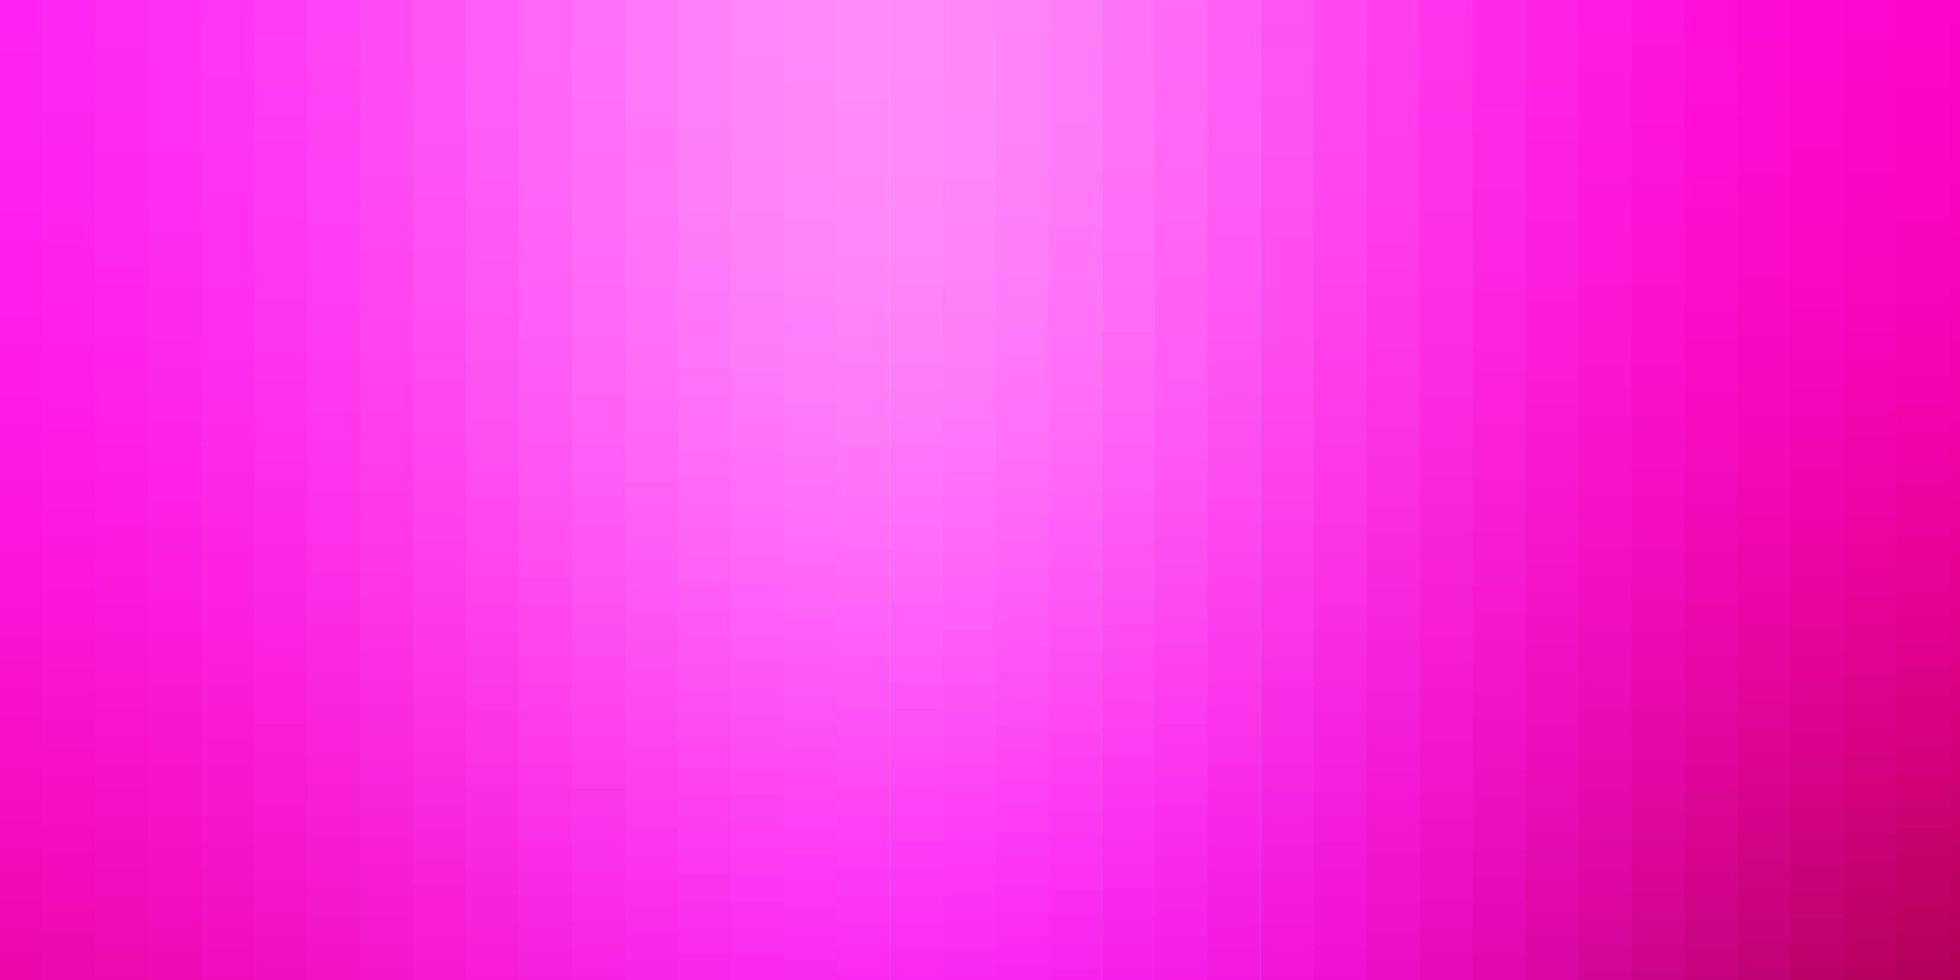 Pink texture in rectangular style. vector